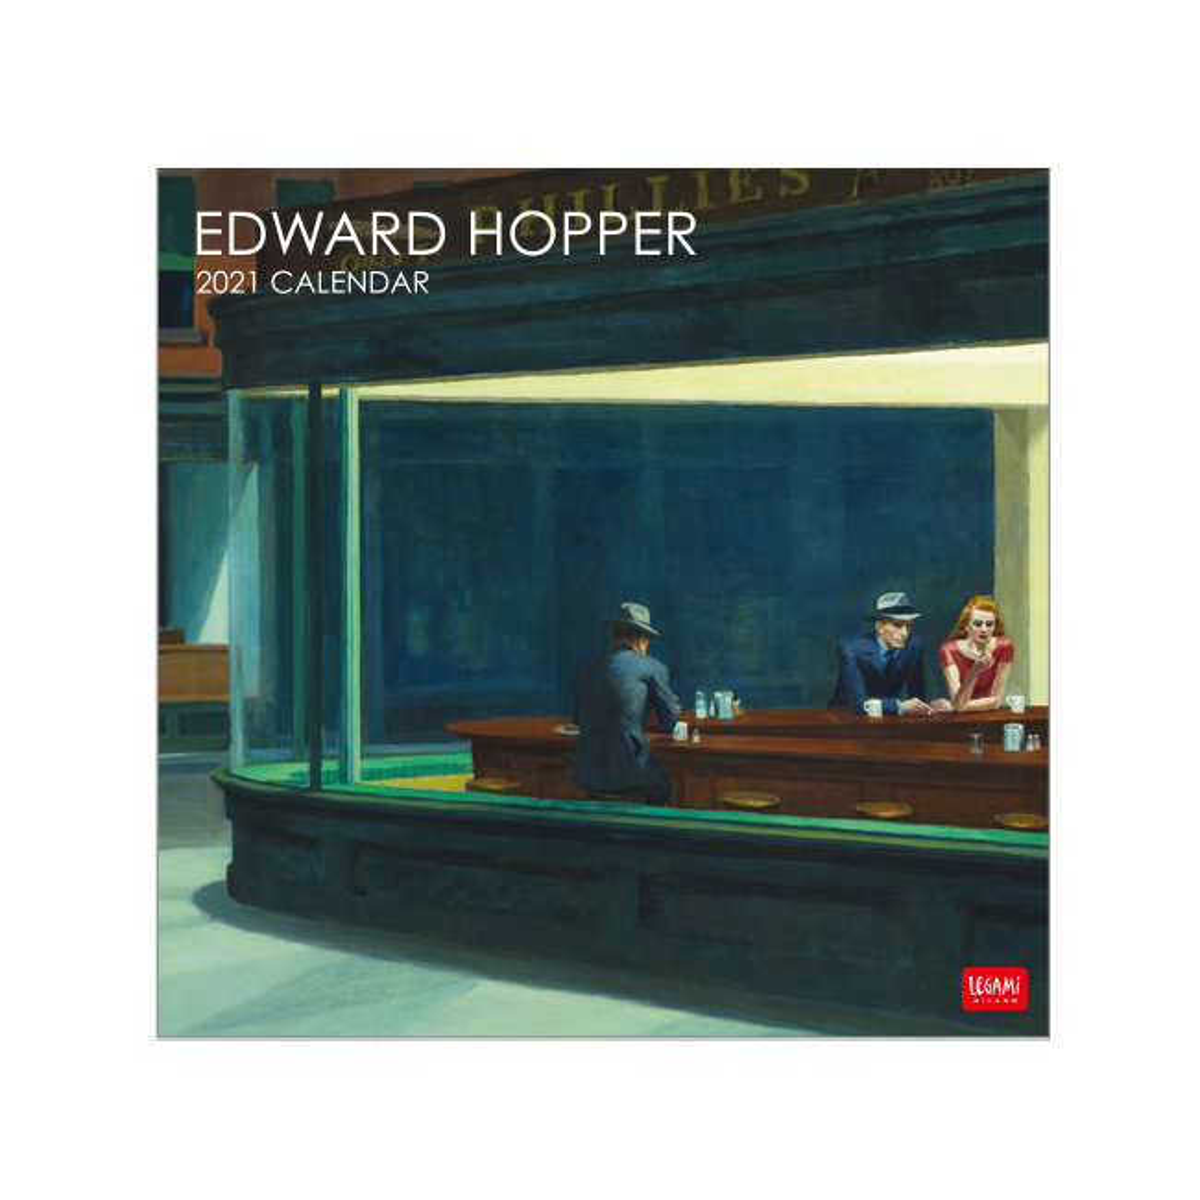 Calendrier Snooker 2021 Calendrier 2021 Edouard Hopper